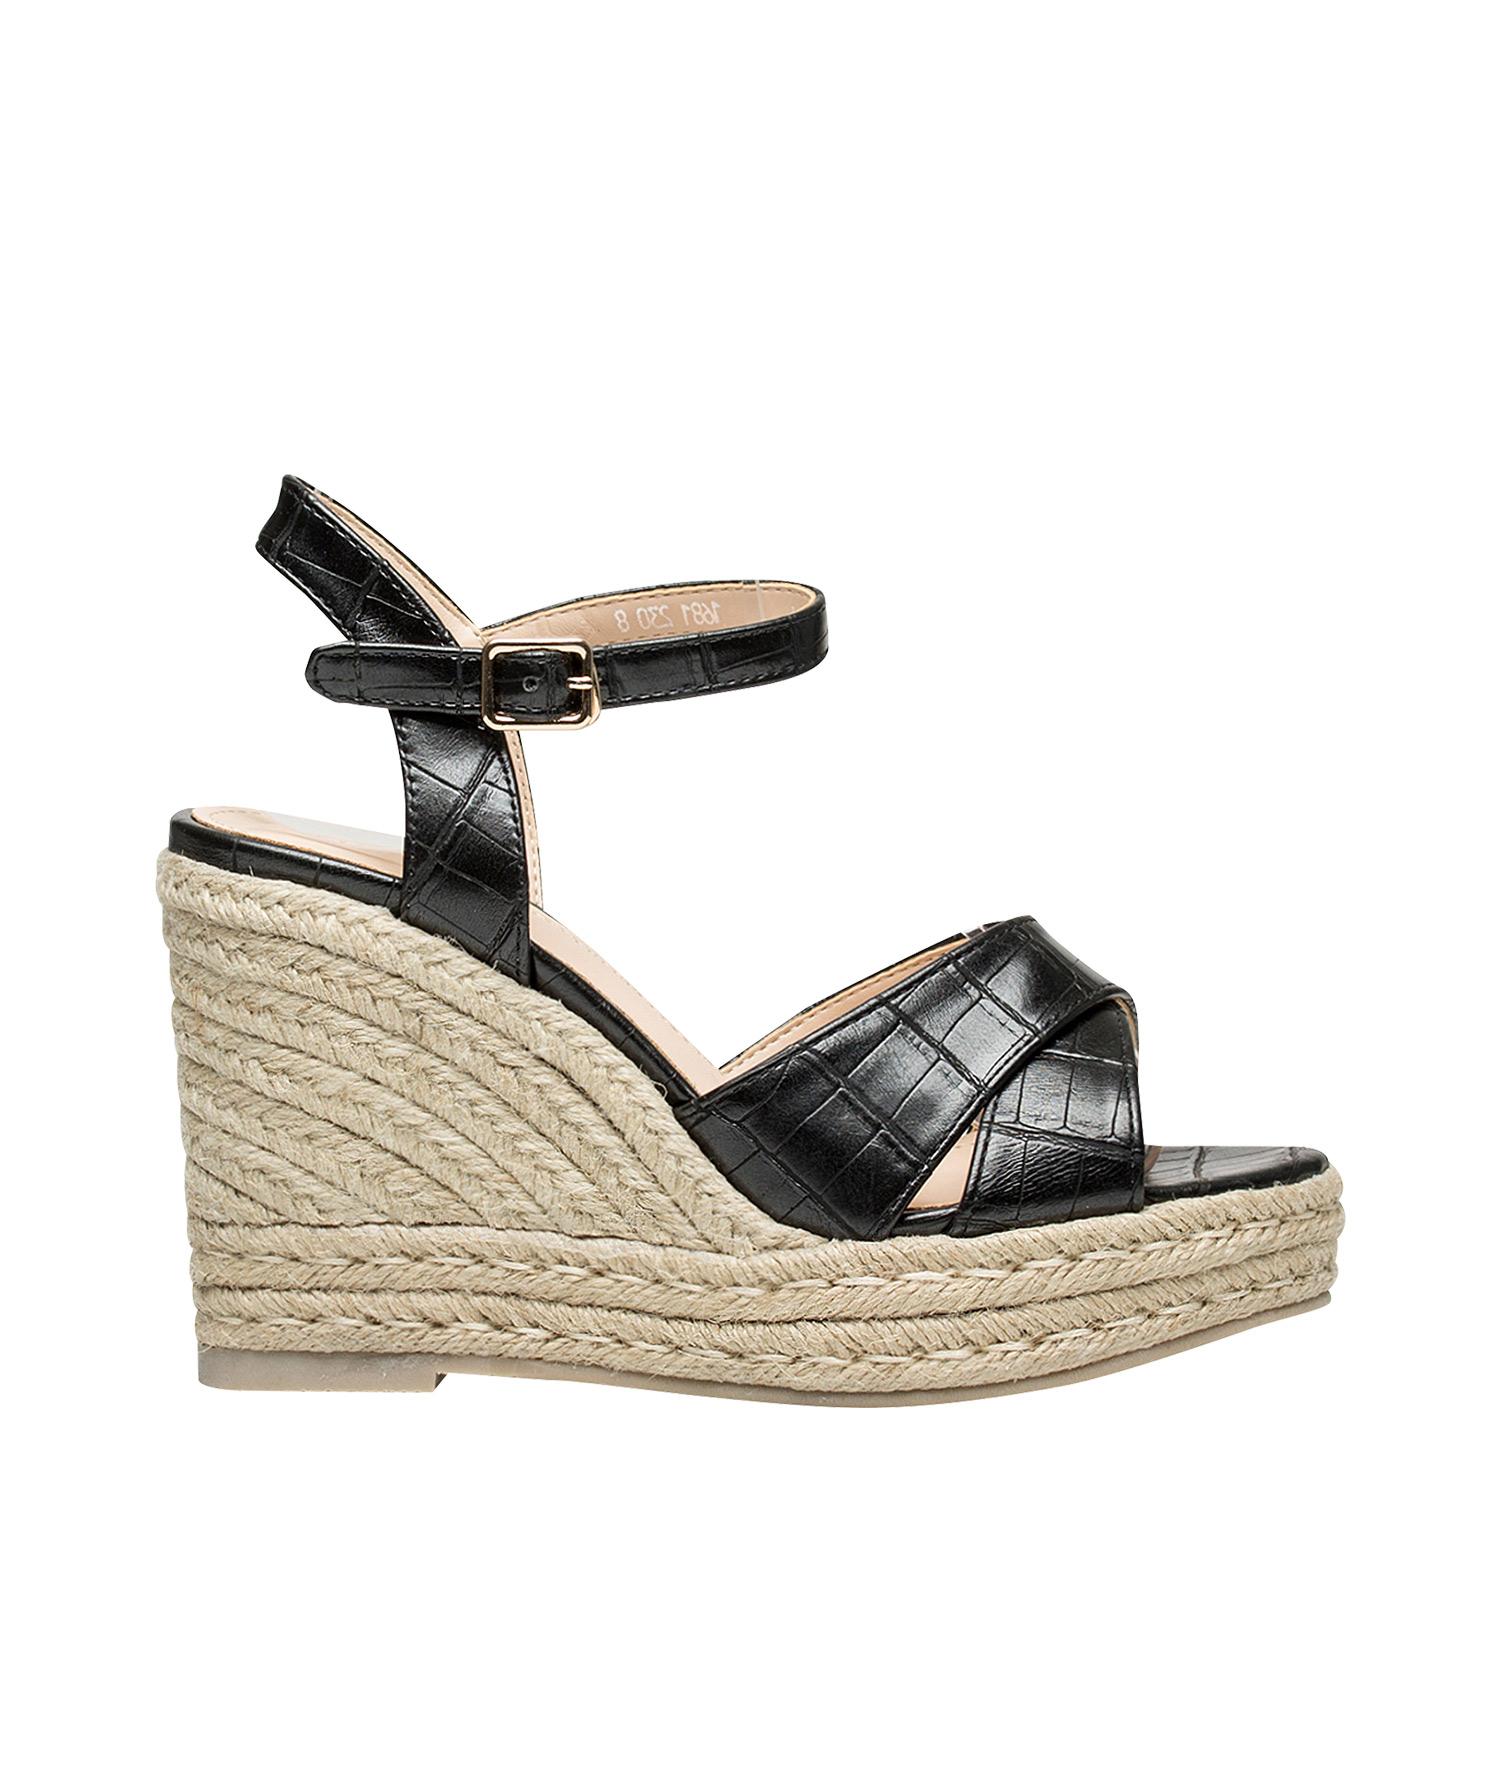 75846edeb4d Croc-Embossed Espadrille Wedge Sandals